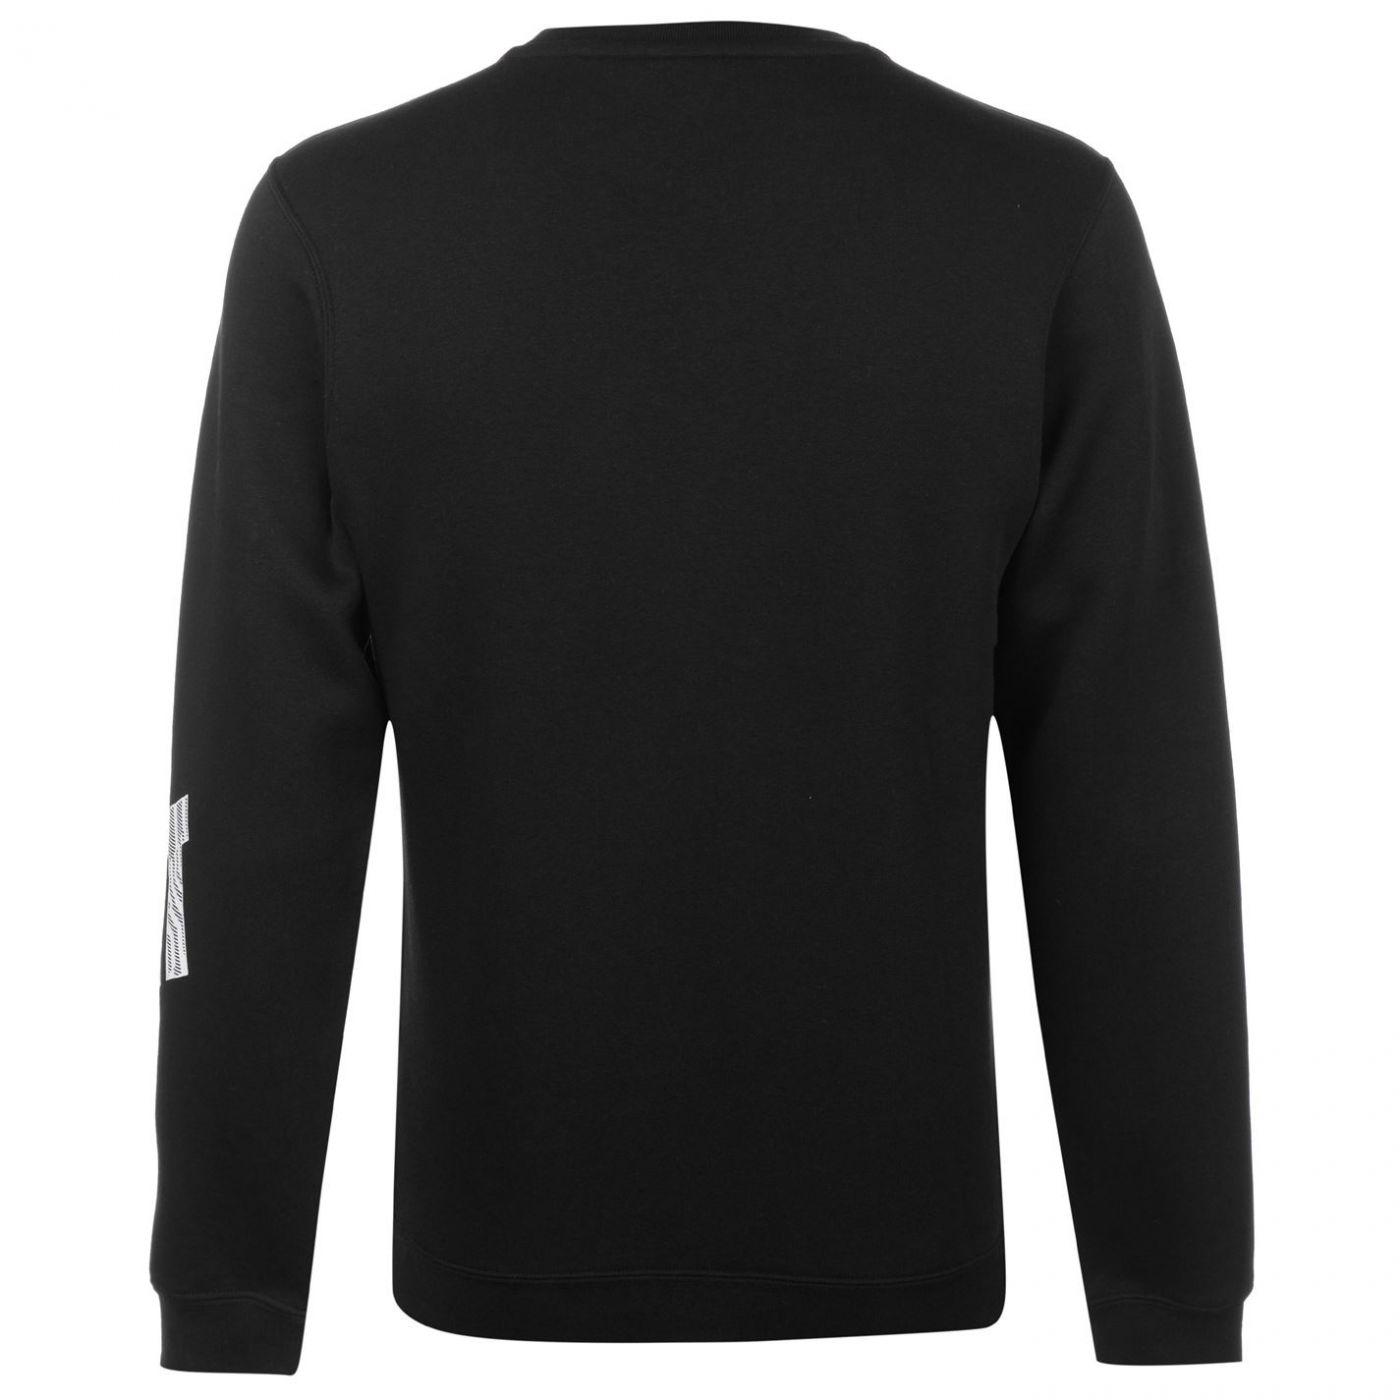 Nike Fleece Graphic Crew Sweater Mens